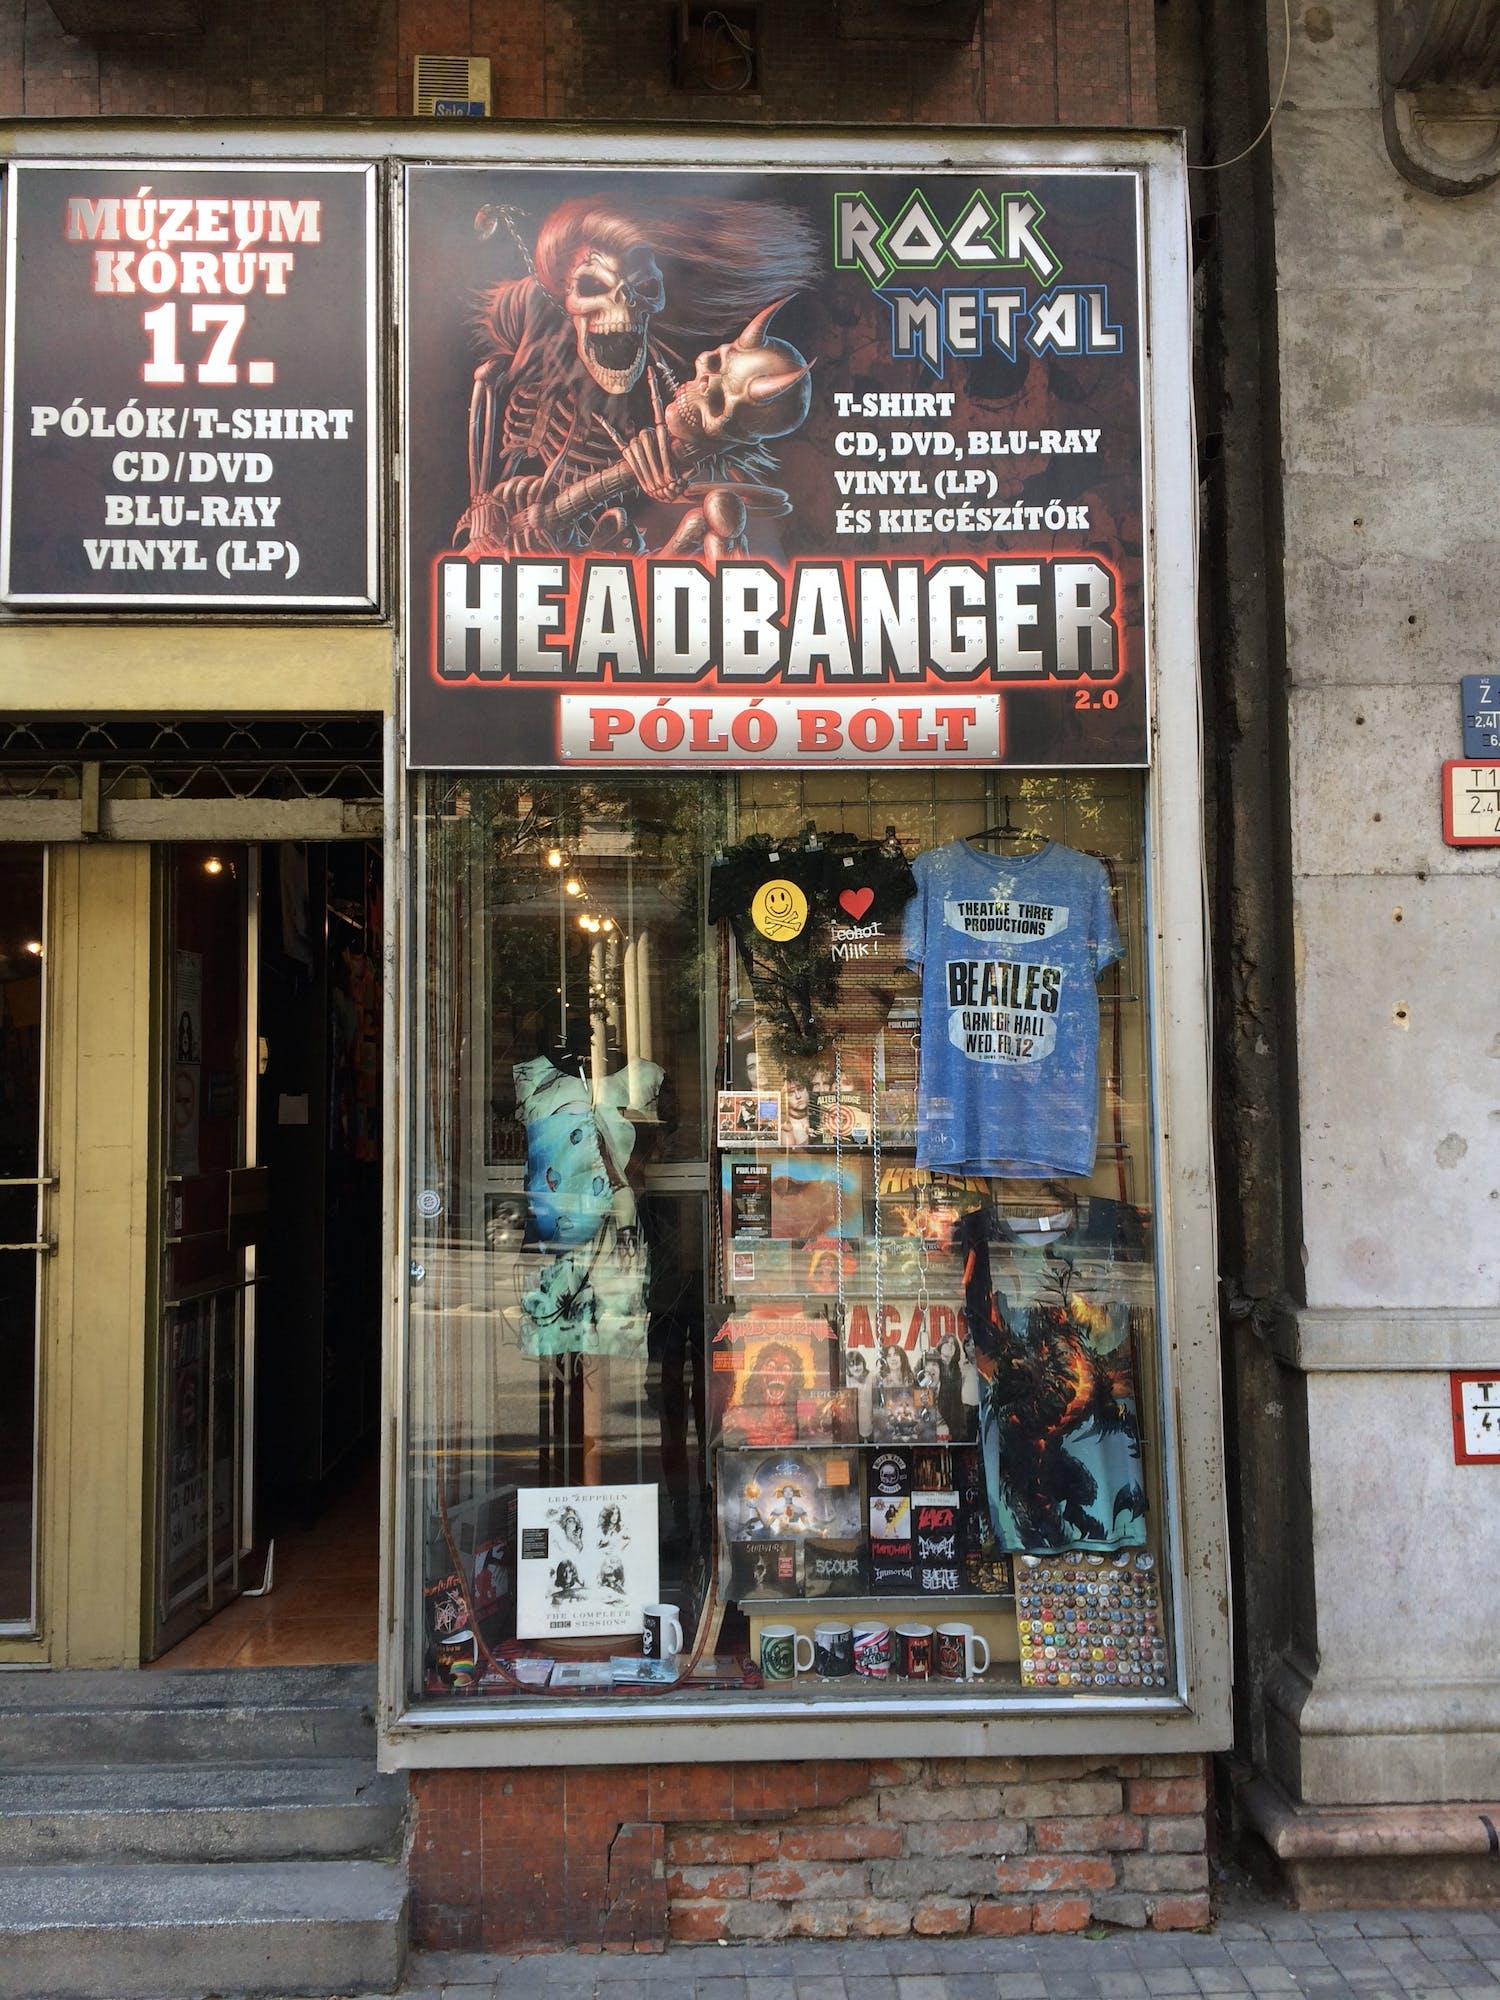 Headbanger - Record Store Image